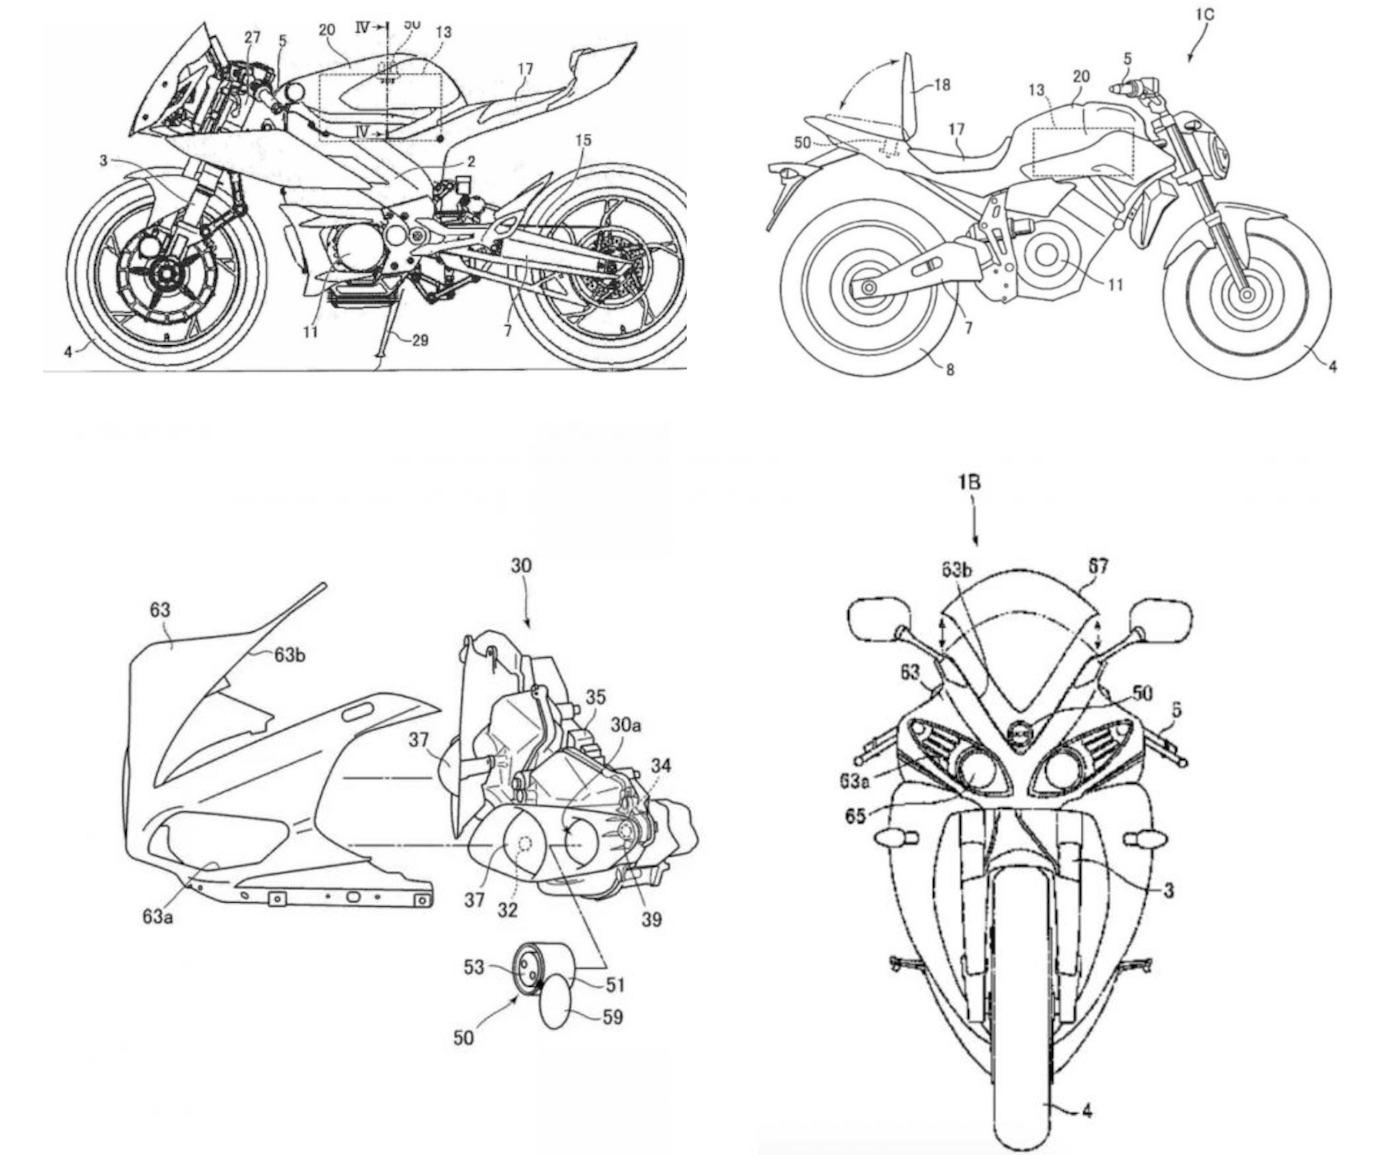 Yamaha Files Various Electric Motorcycle Patents